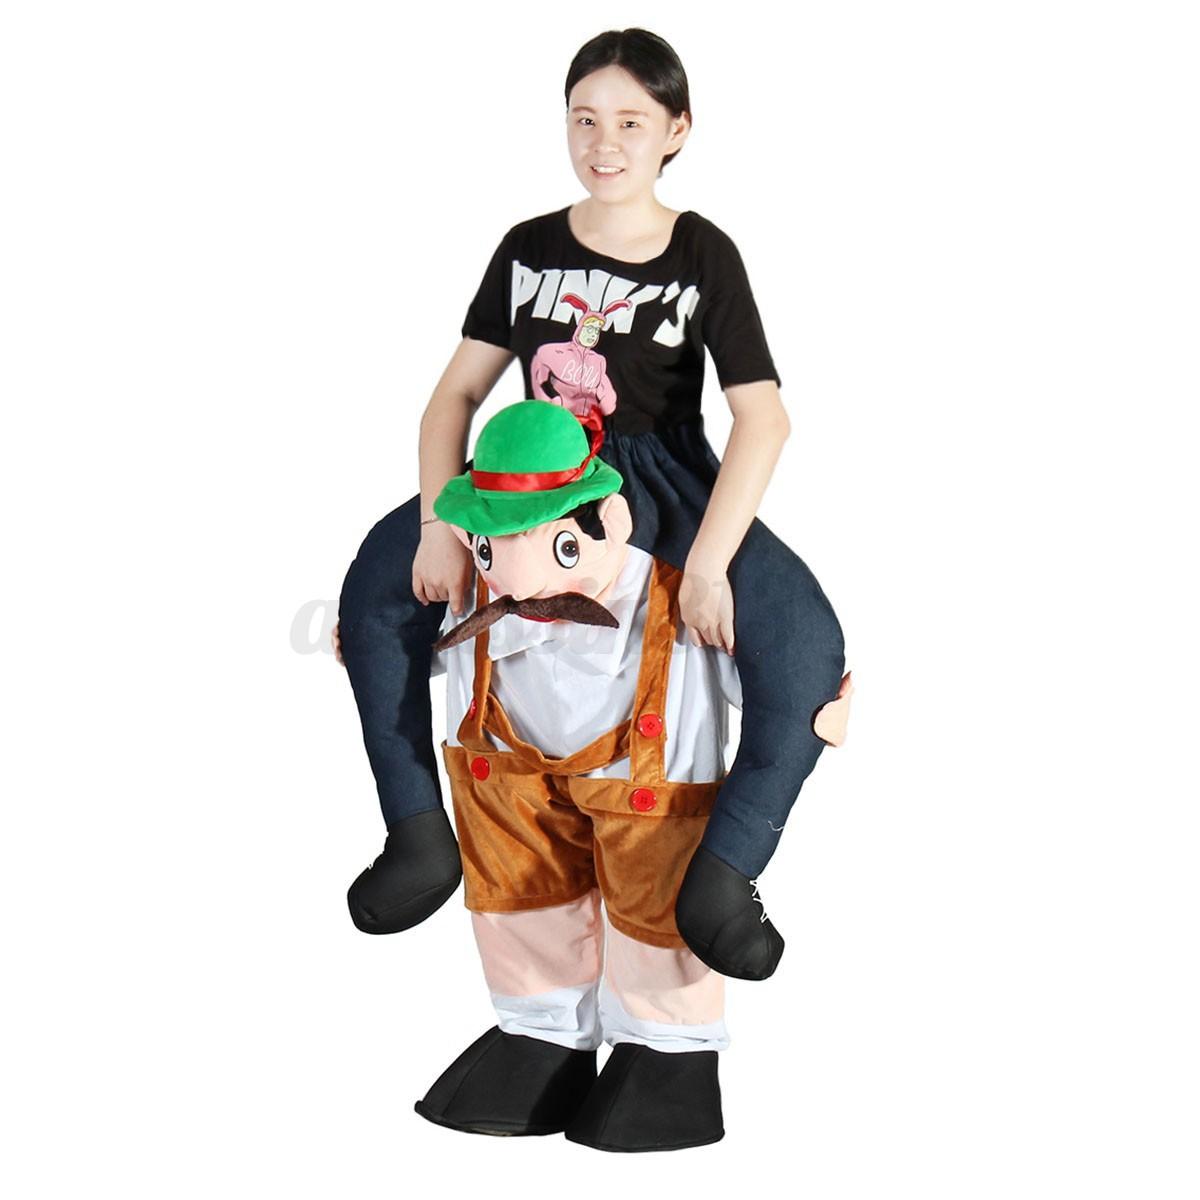 snowman carry me fancy piggy back ride on dress party dwarf mascot costume pants ebay. Black Bedroom Furniture Sets. Home Design Ideas